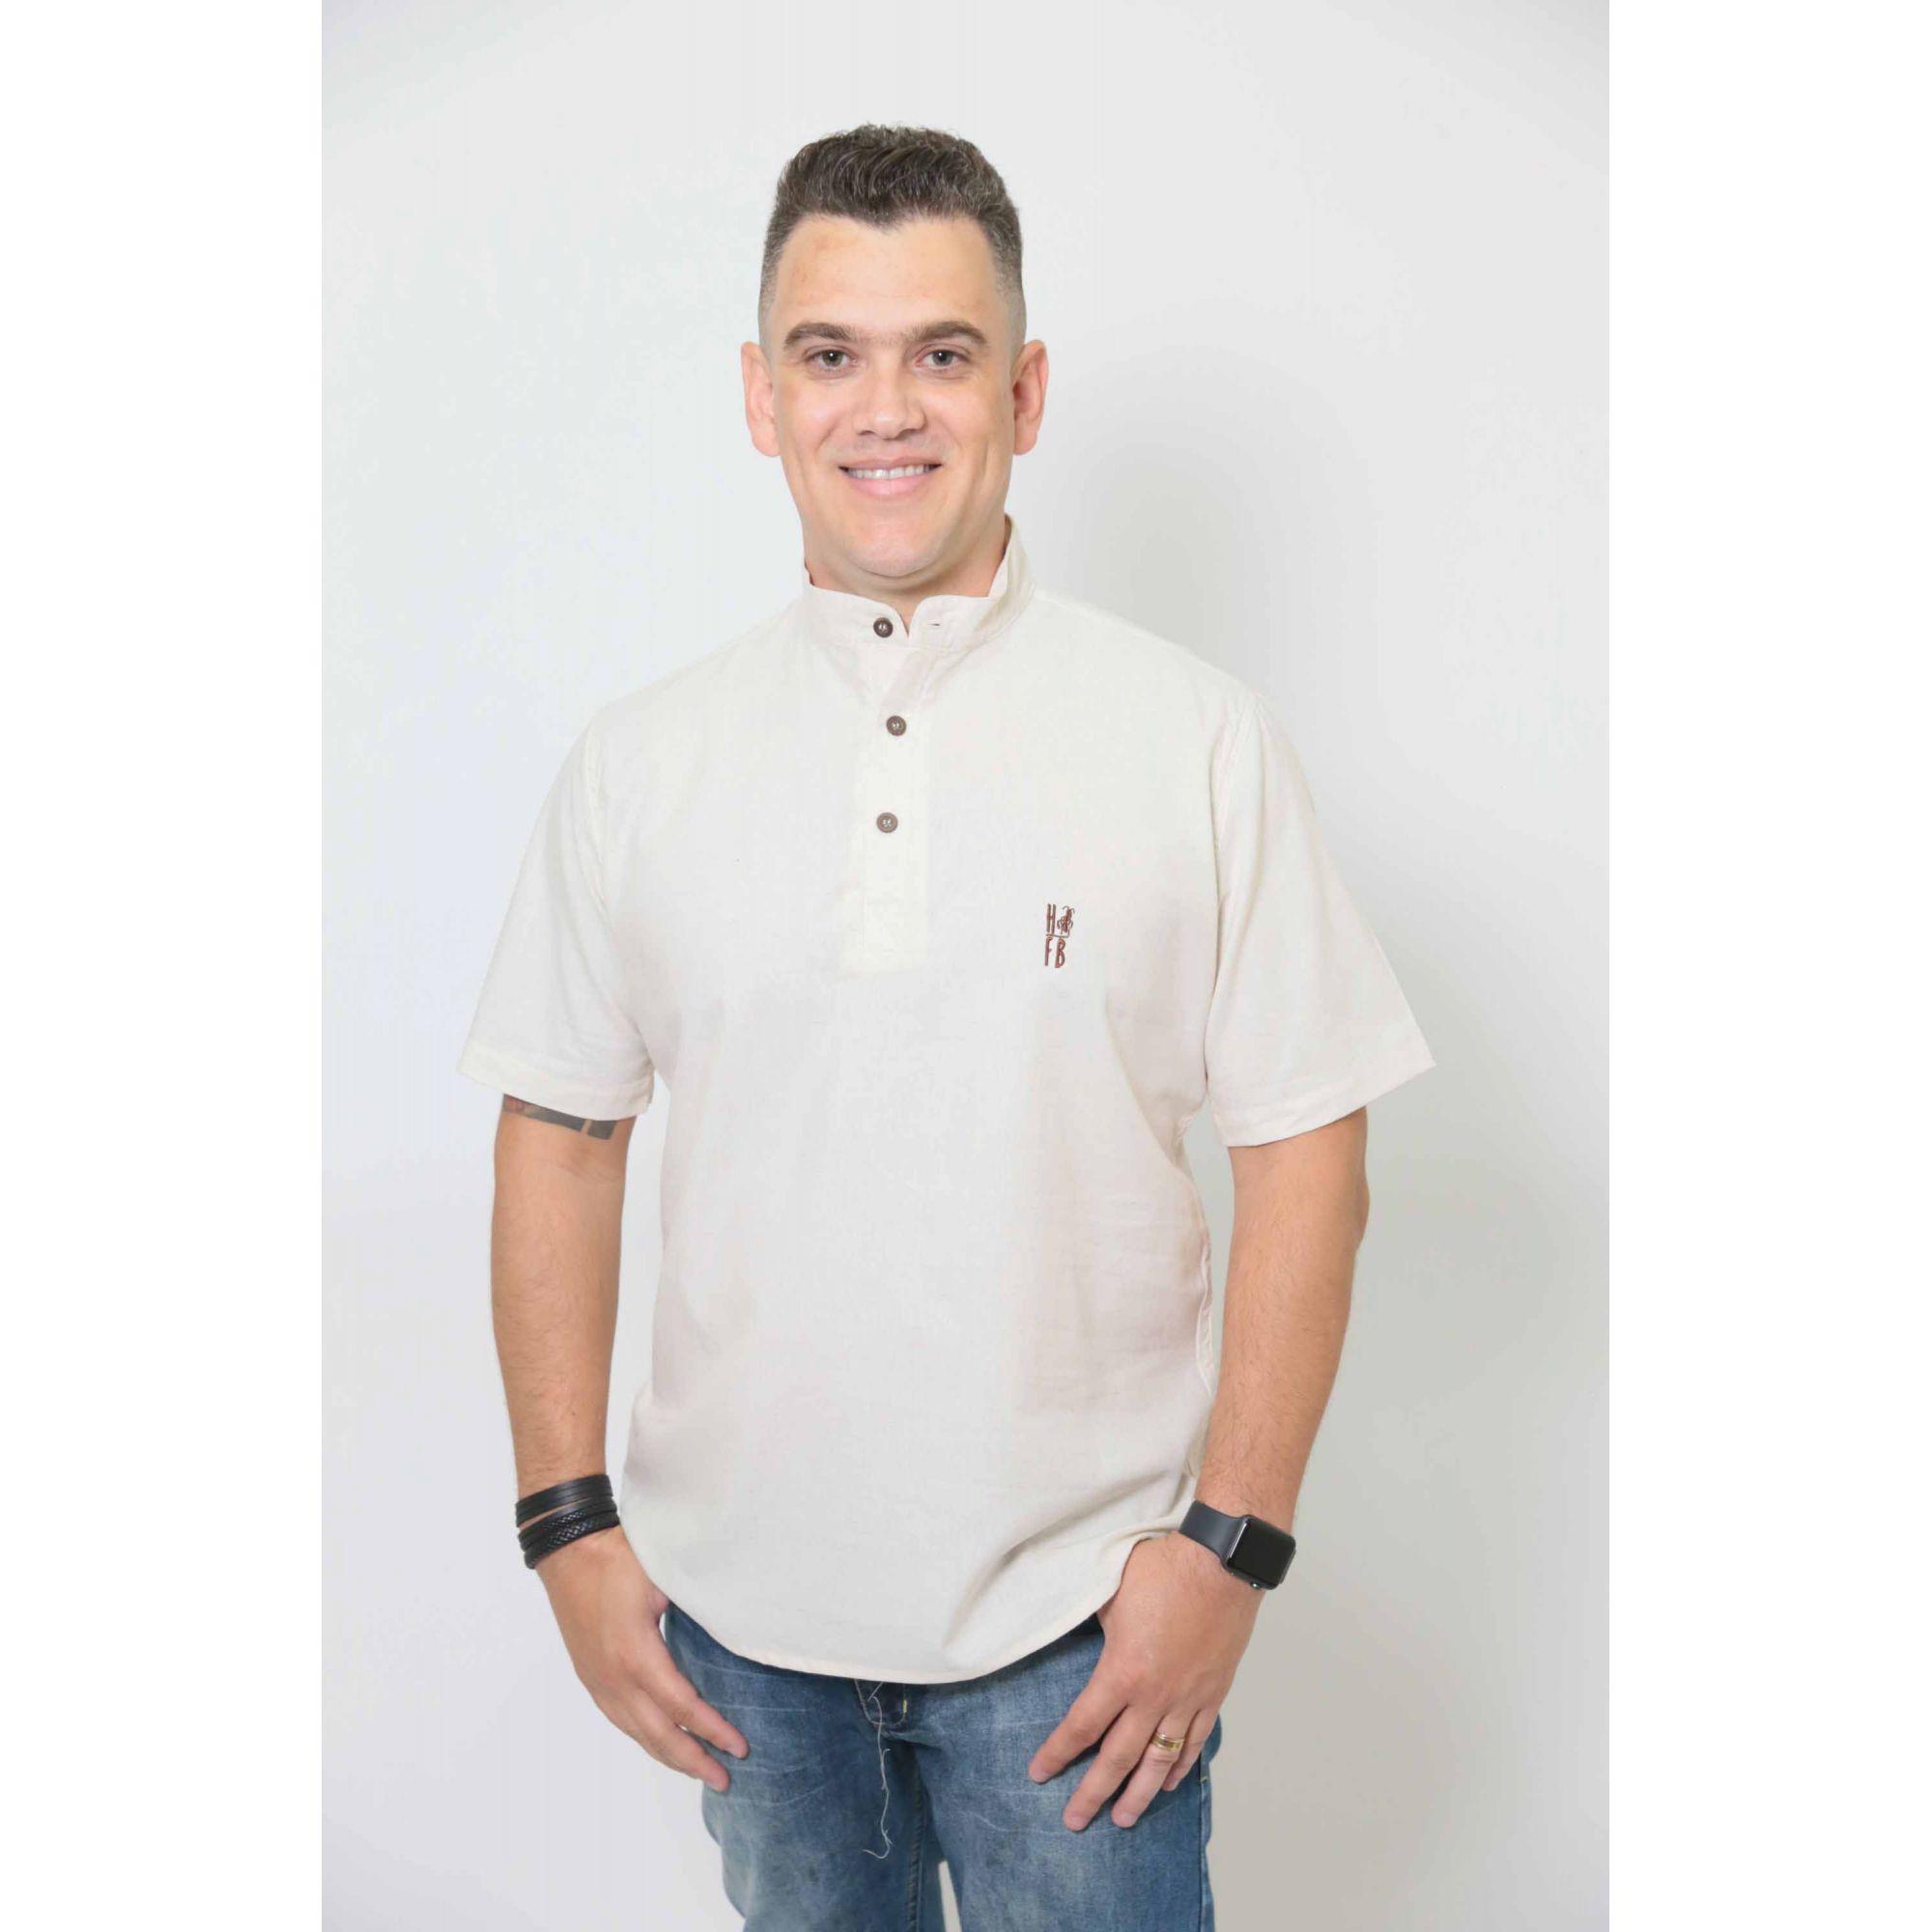 PAI E FILHO > Kit 02 Camisas Bata Gola Padre [Coleção Tal Pai Tal Filho]  - Heitor Fashion Brazil